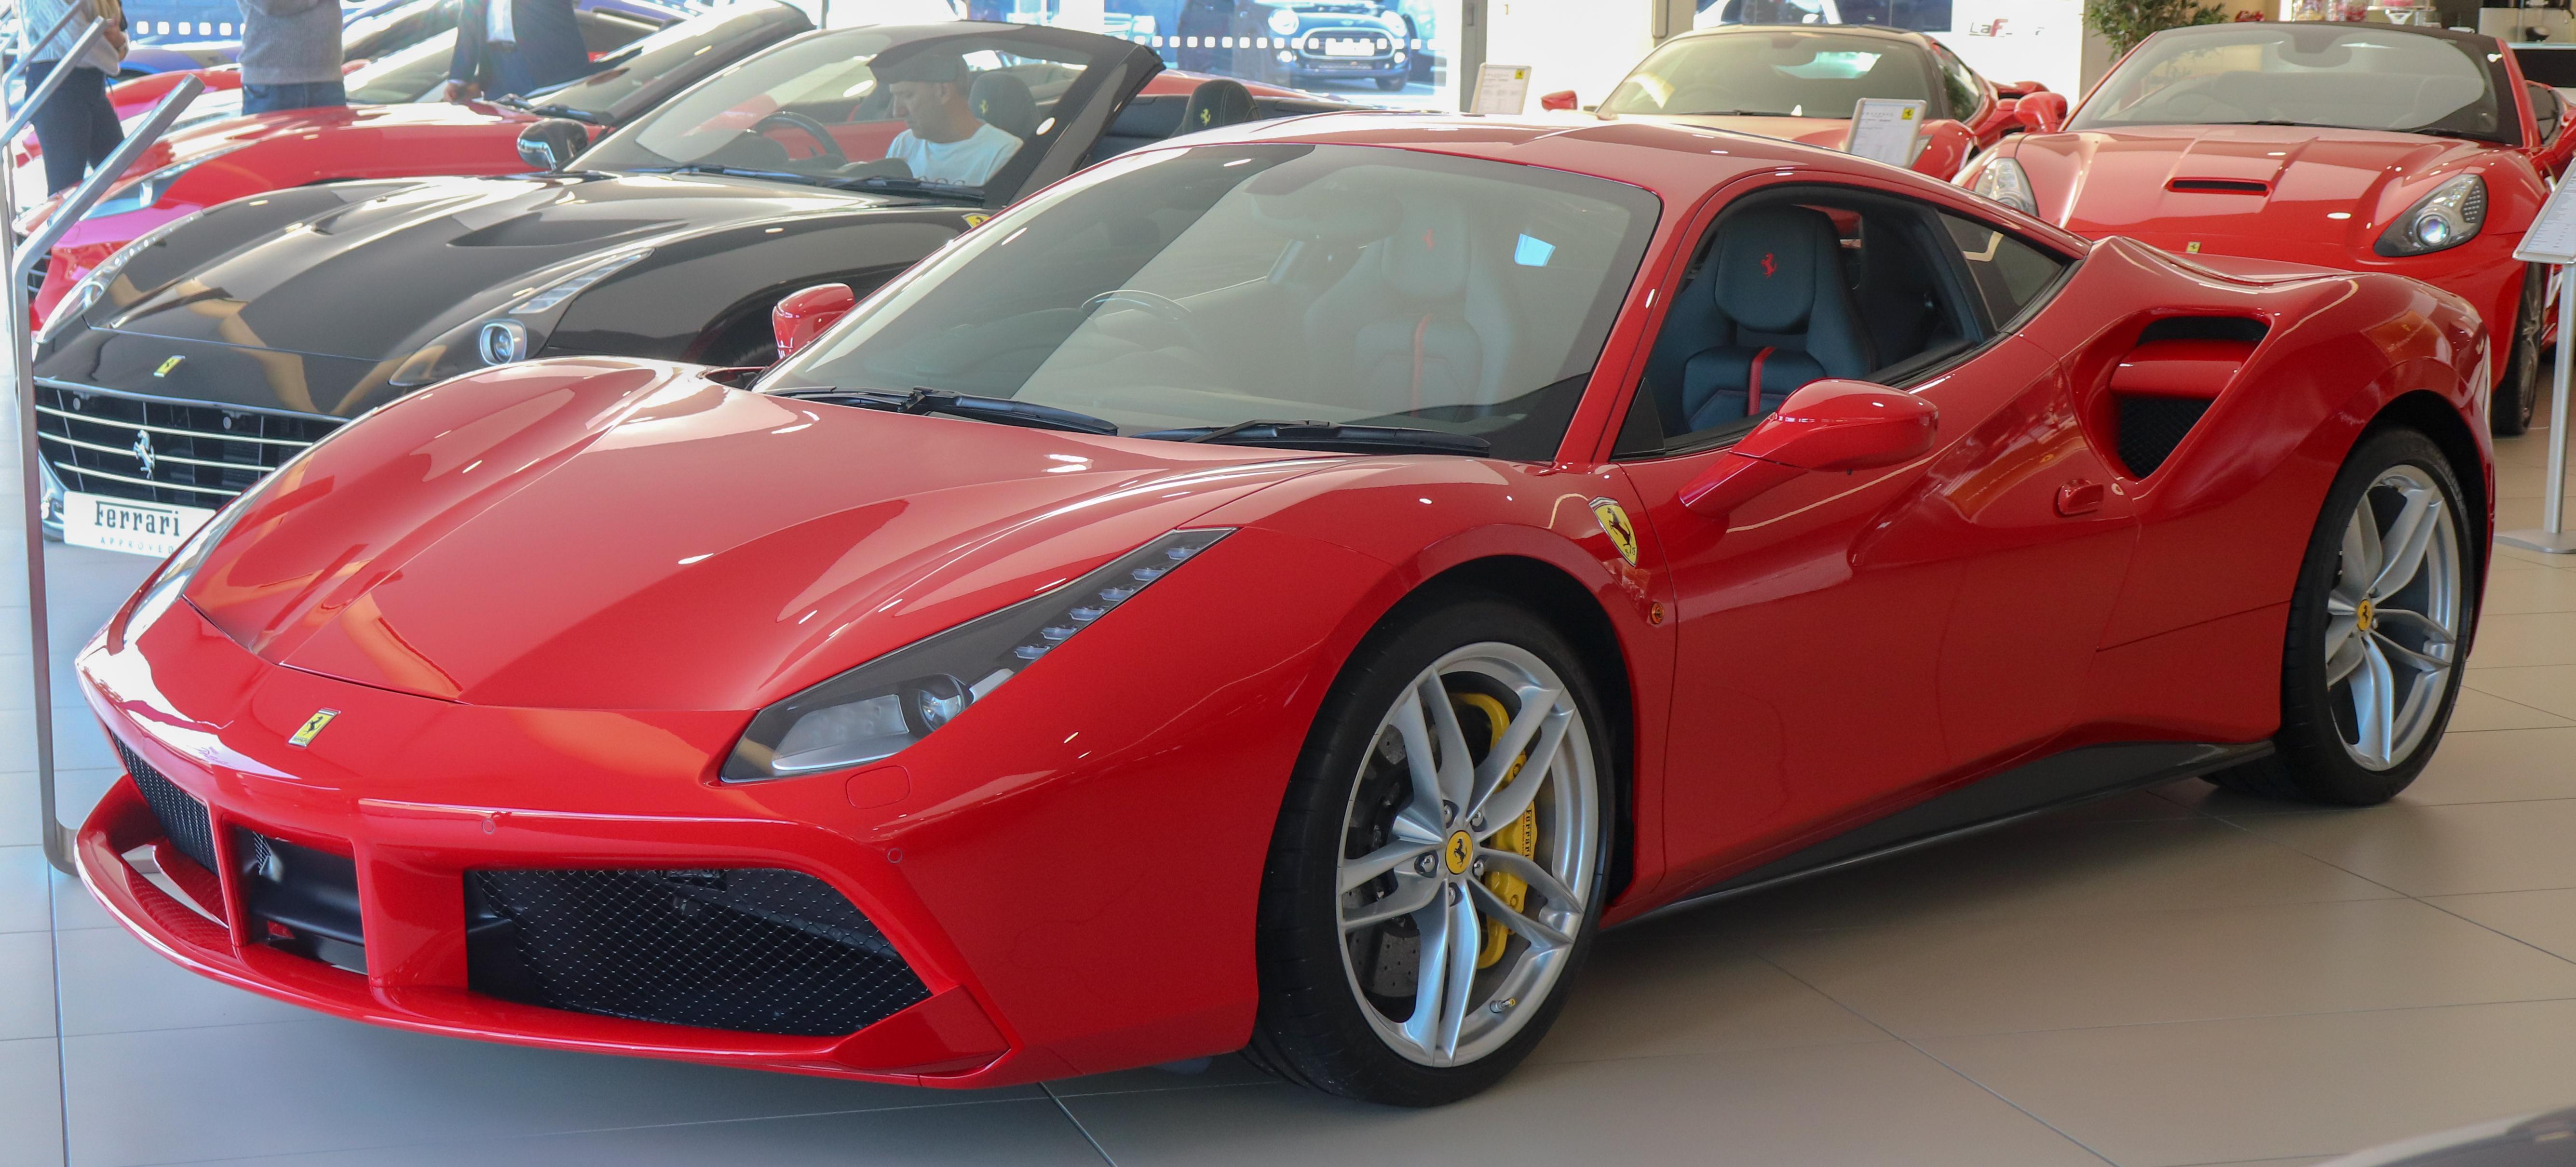 Ferrari 488 - Wikipedia